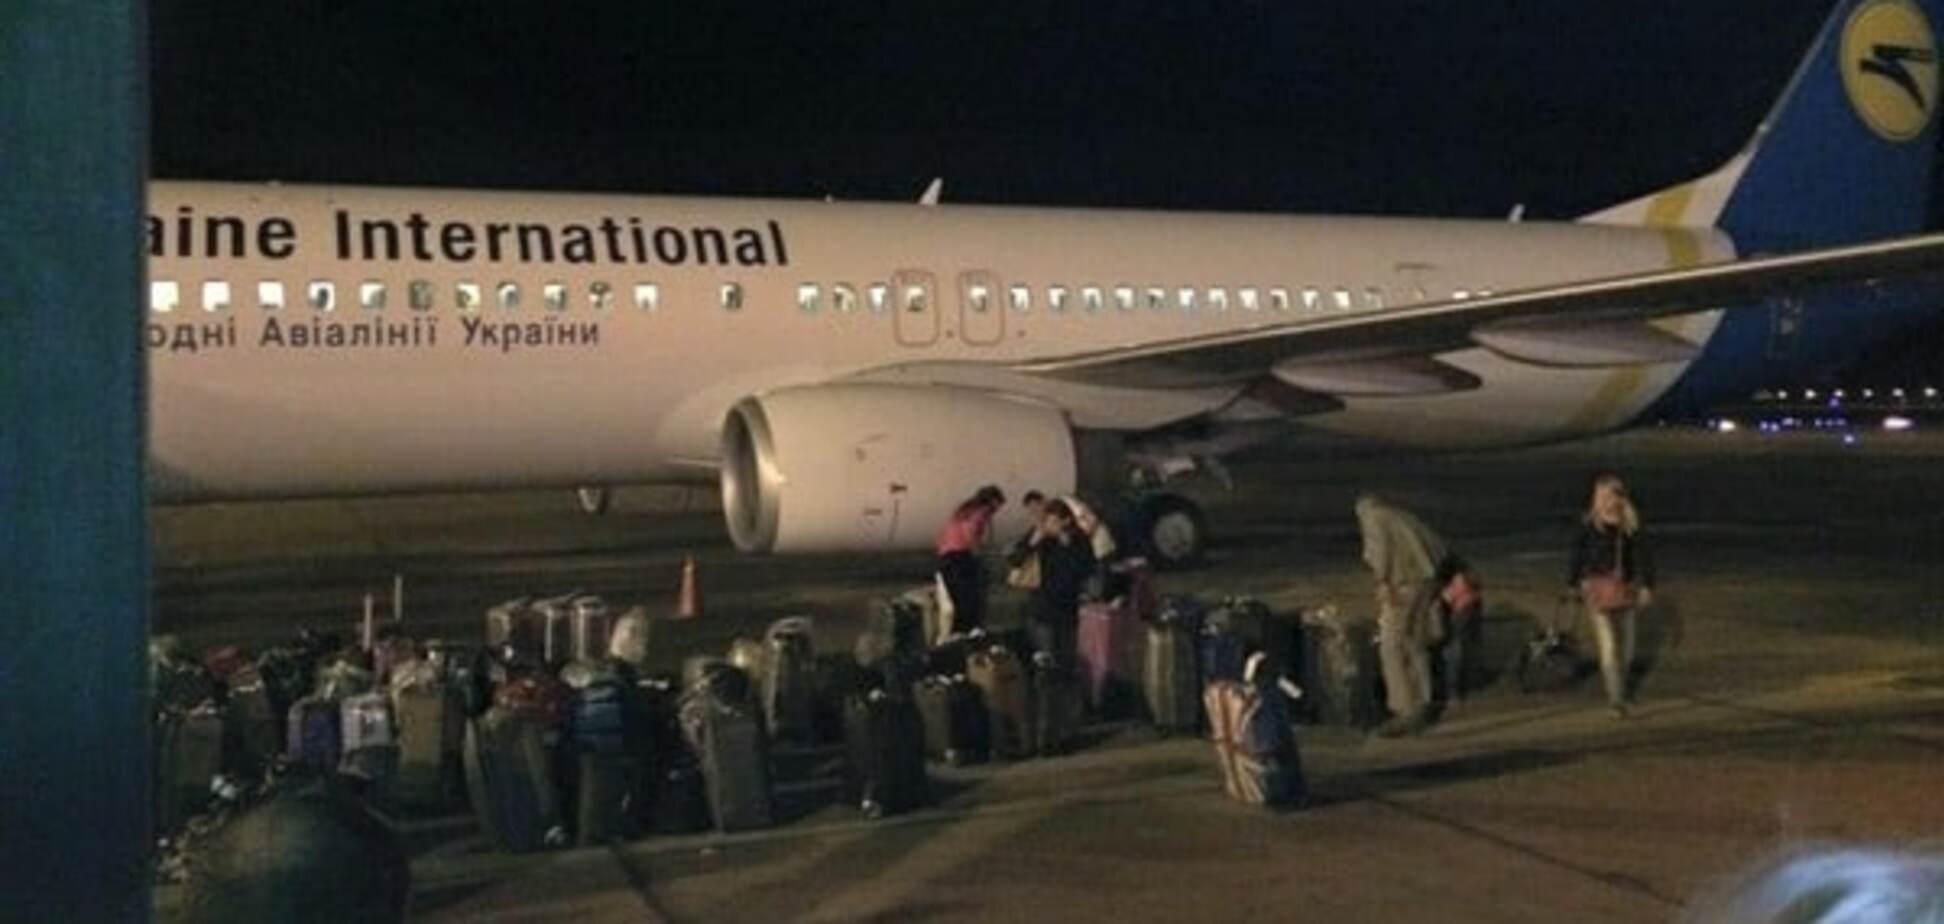 В аэропорту Шарм-эль-Шейха ужесточили правила безопасности